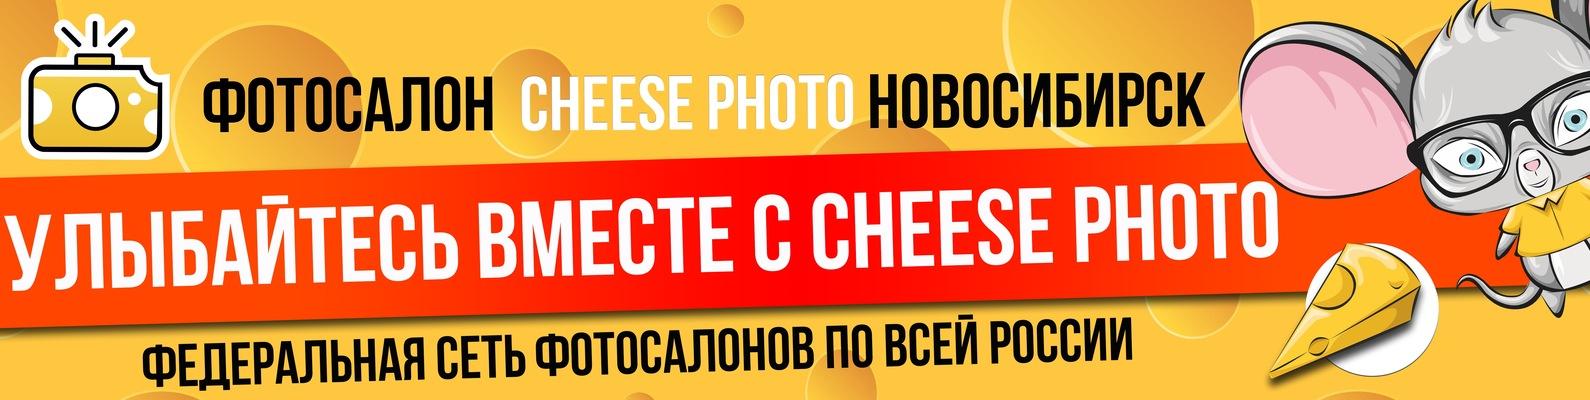 n-photo.ru at WI. Цифровая печать фотографий | БЛИЦ Новосибирск | 400x1590